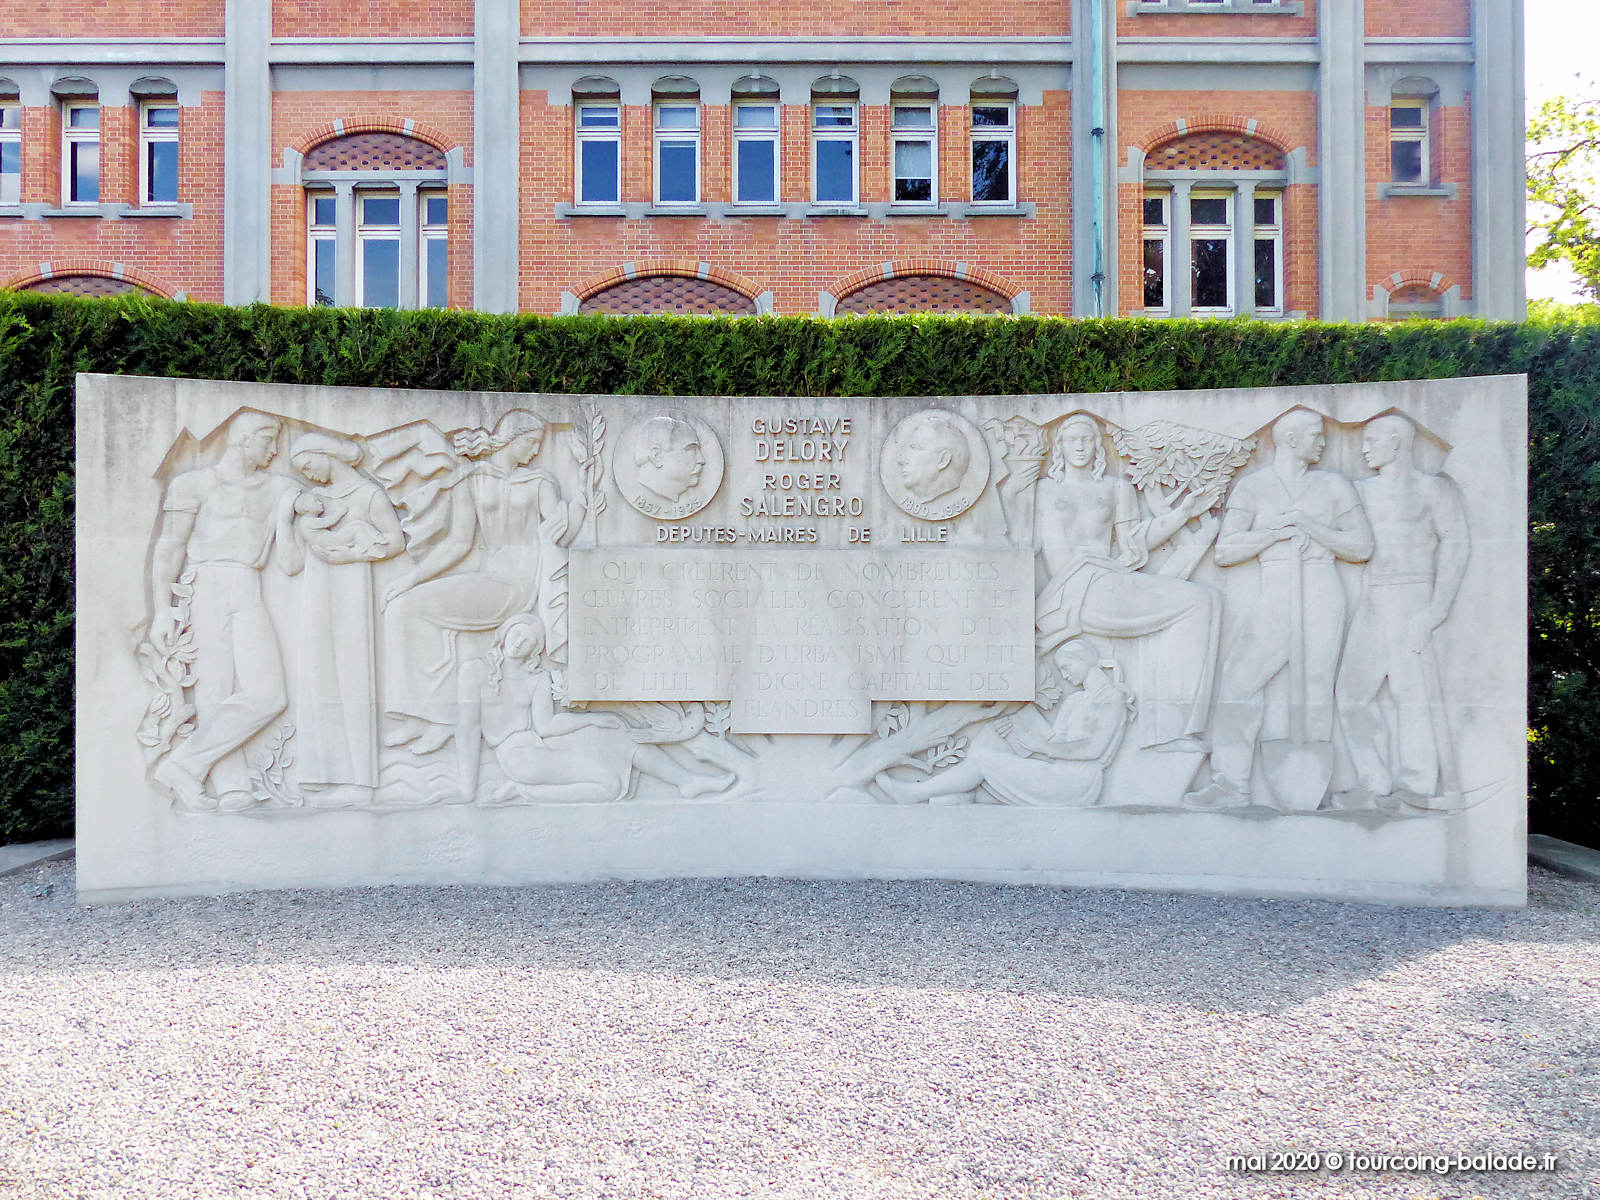 Monument Delory Salengro, Lille, 2020